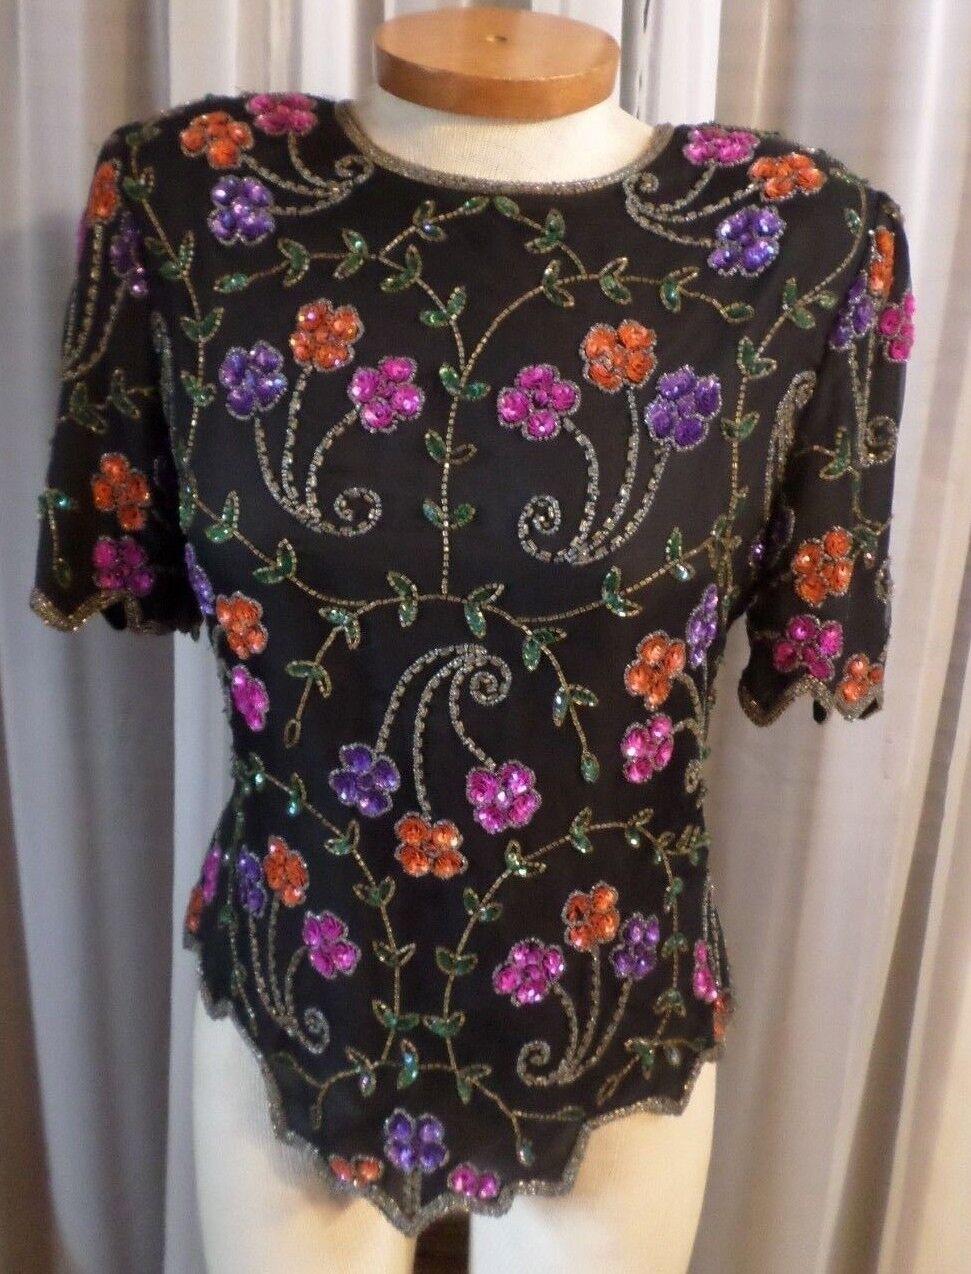 Lady Large schwarz Silk Blouse Top Woman L Bead Sequins Vintage Formal Evening 12